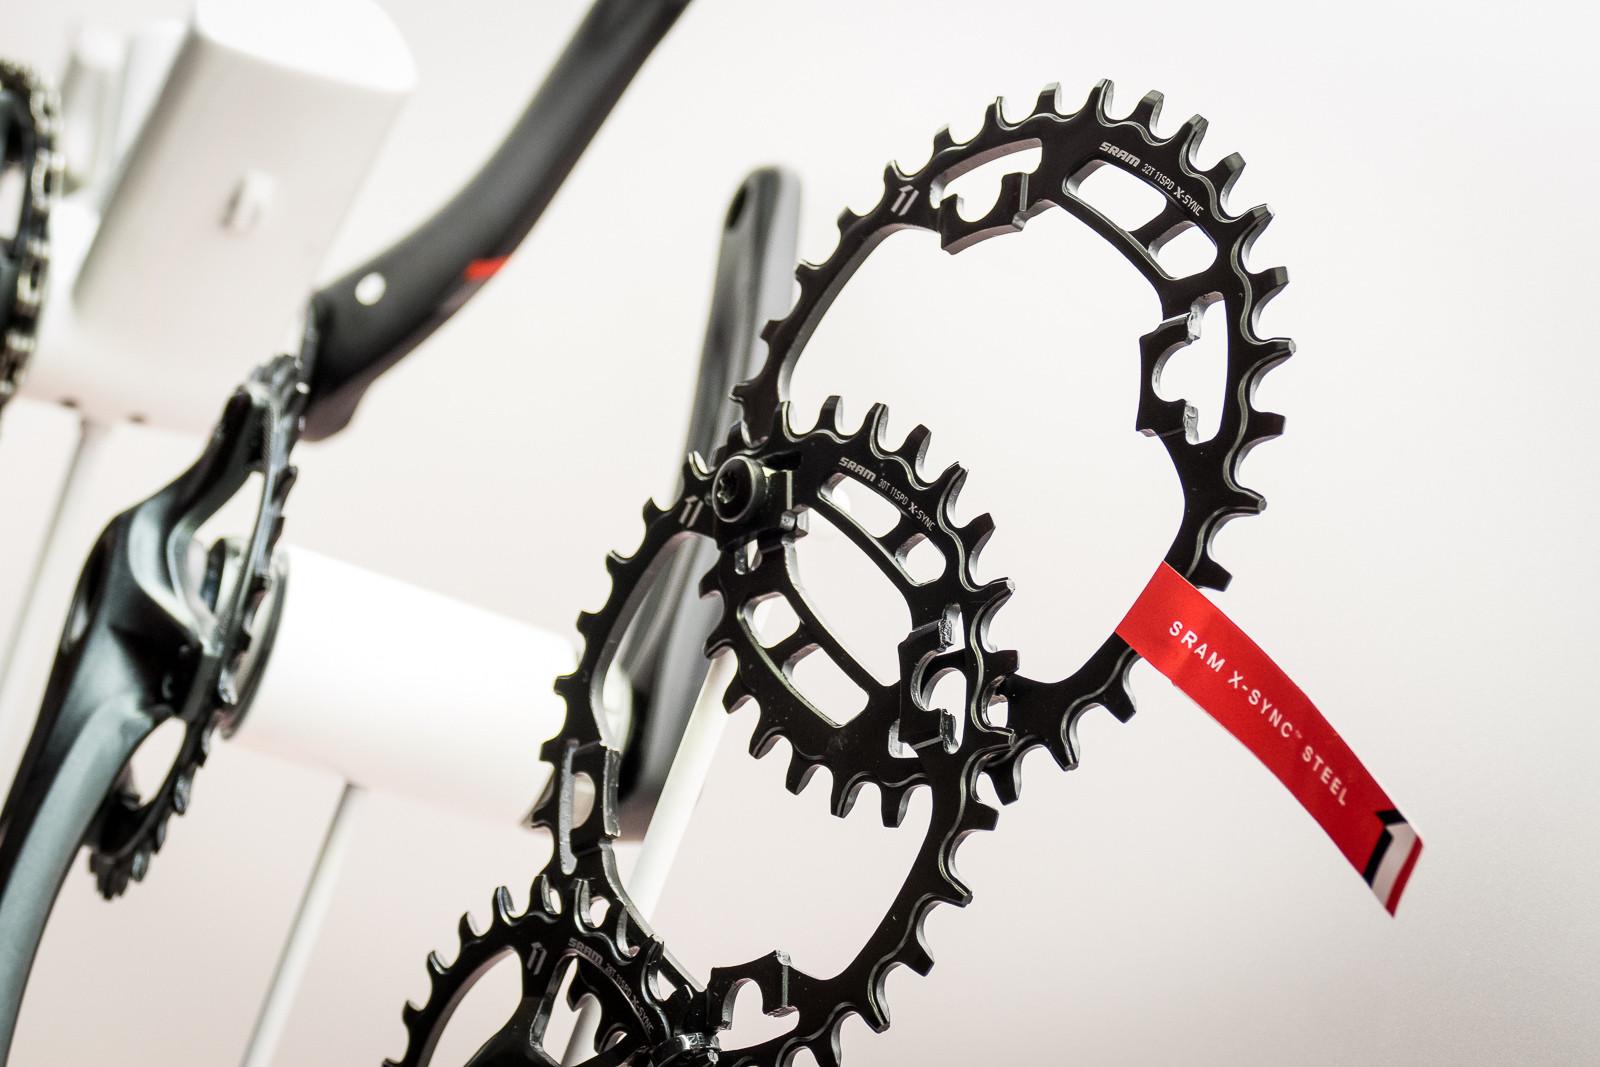 SRAM X-Sync Steel Chainrings - 2016 Mountain Bike Components at Eurobike - Mountain Biking Pictures - Vital MTB